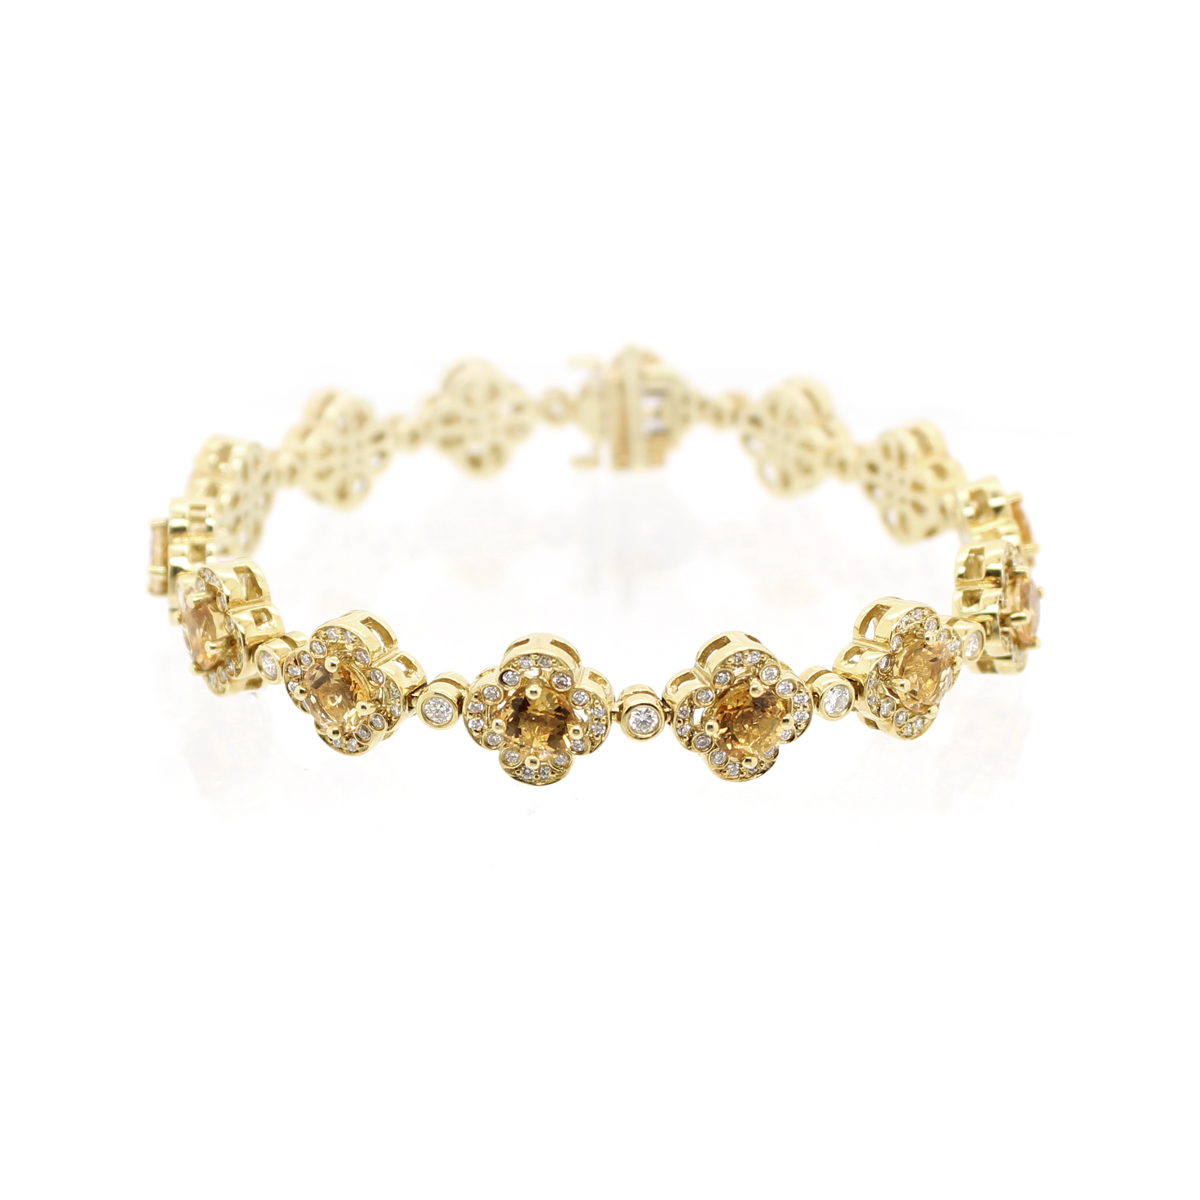 Estate Charles Krypell 18 Karat Yellow Gold Diamond and Citrine Link Bracelet